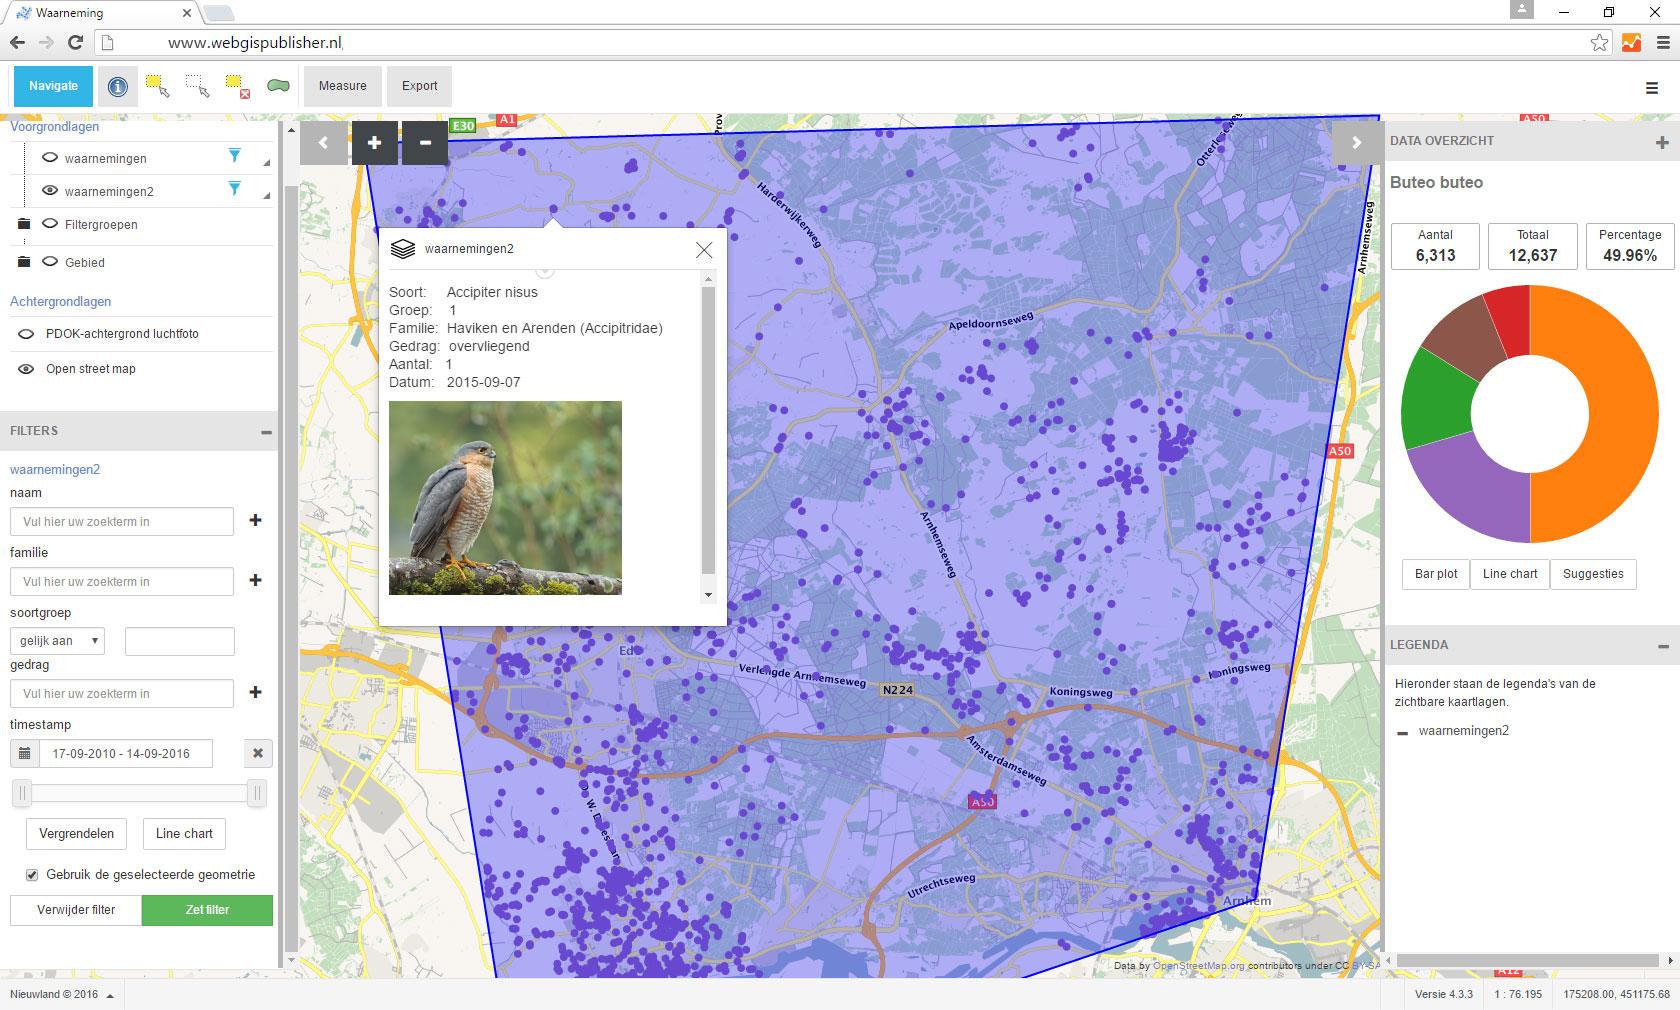 data mining via WebGIS Publisher